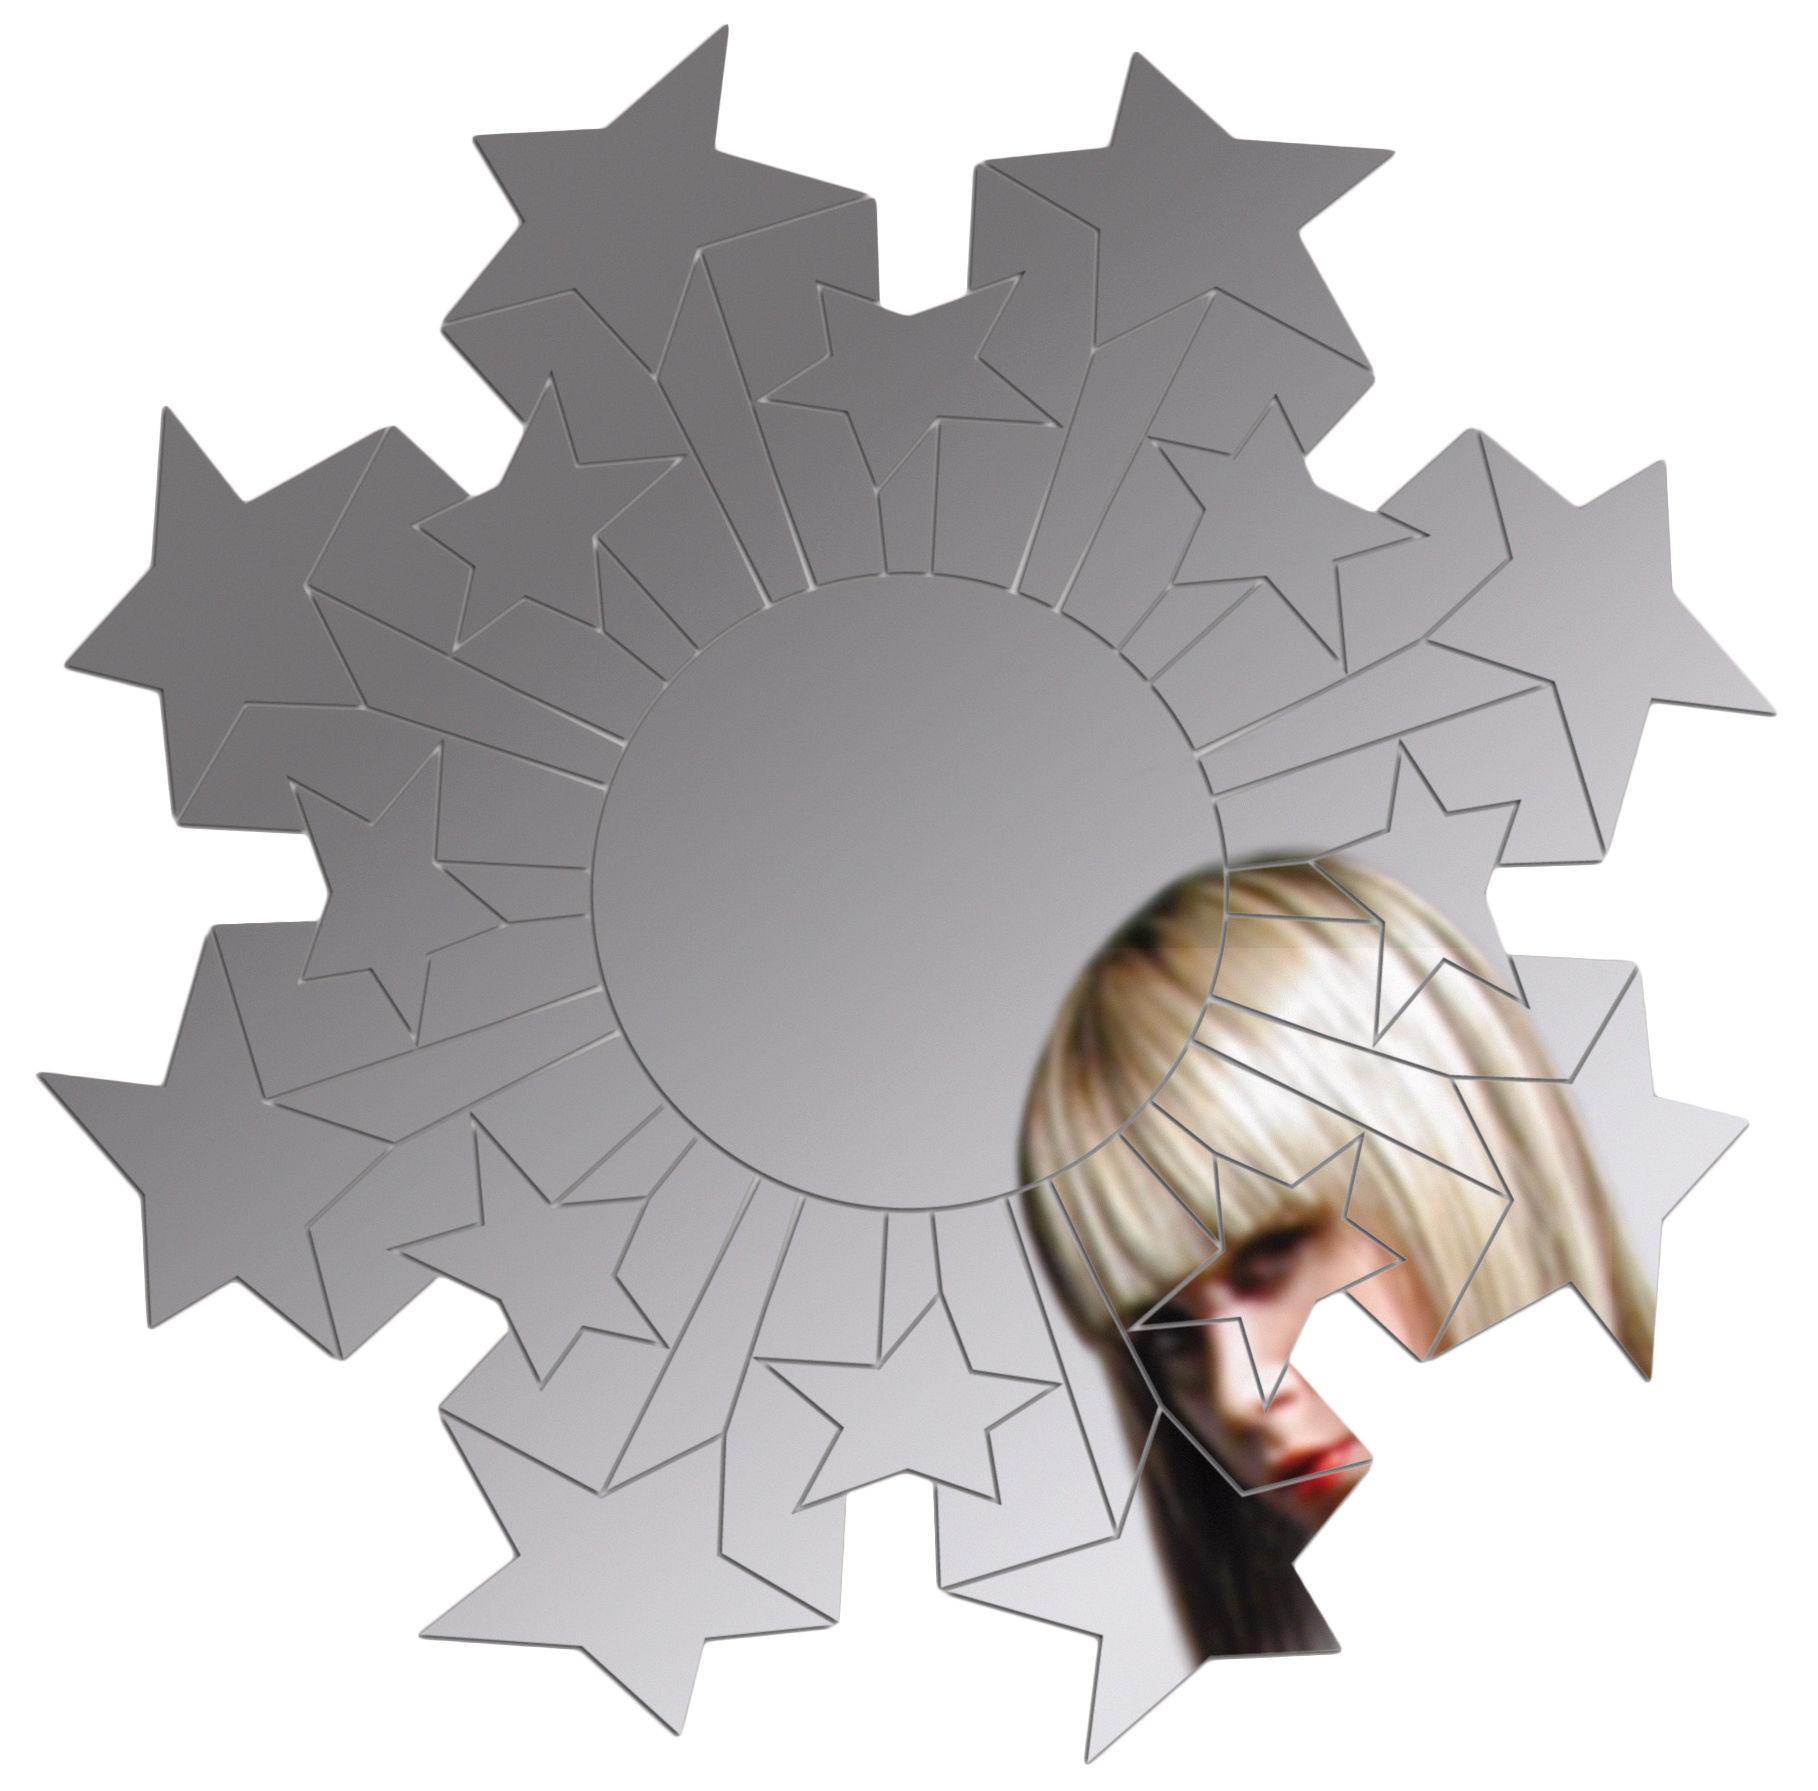 Möbel - Spiegel - Rising Star Selbstklebende Spiegel selbstklebend - Domestic -  - Plastikmaterial